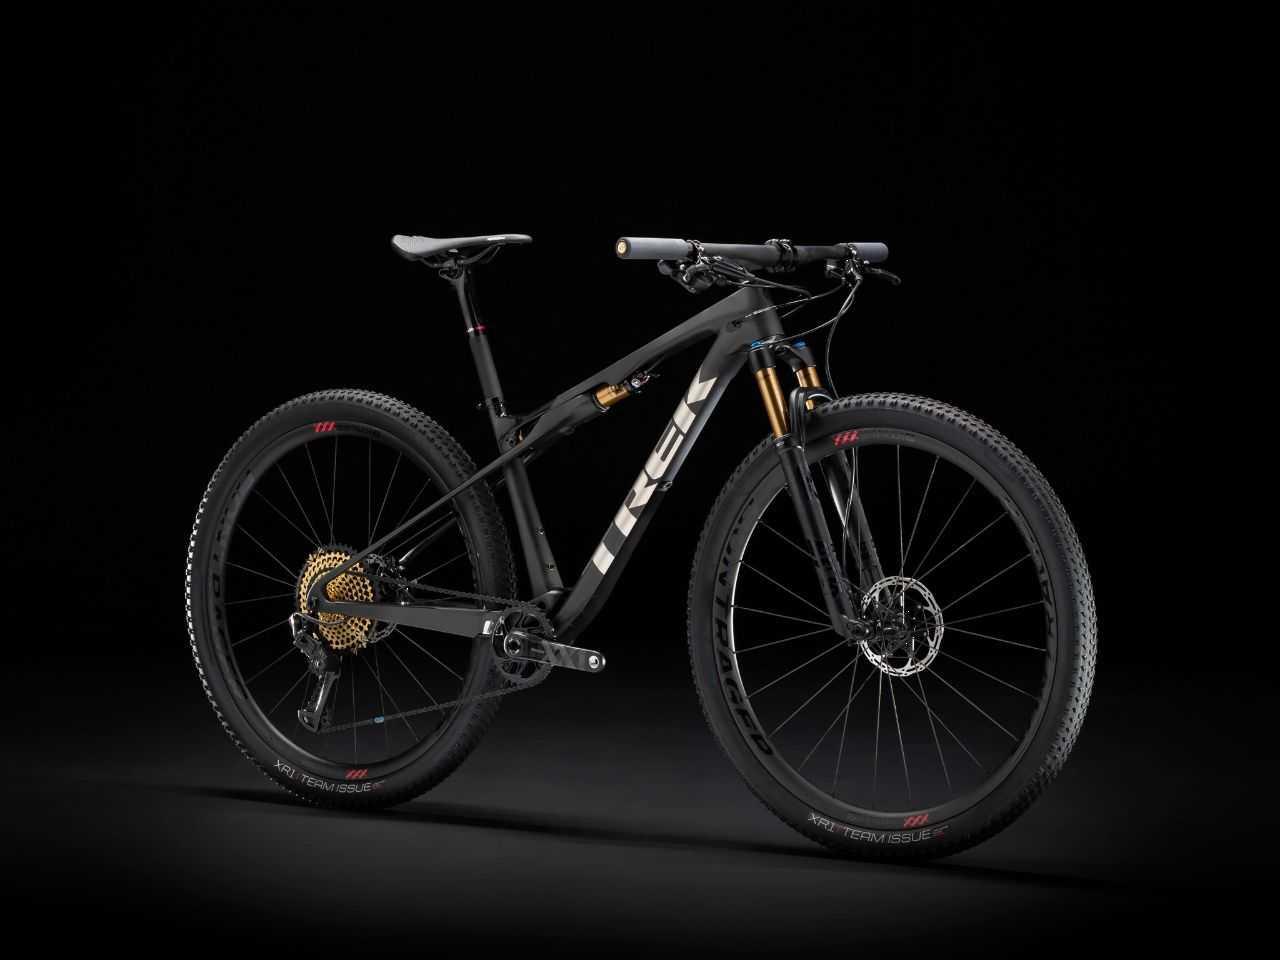 The 2020 Trek Supercaliber cross country race bike.